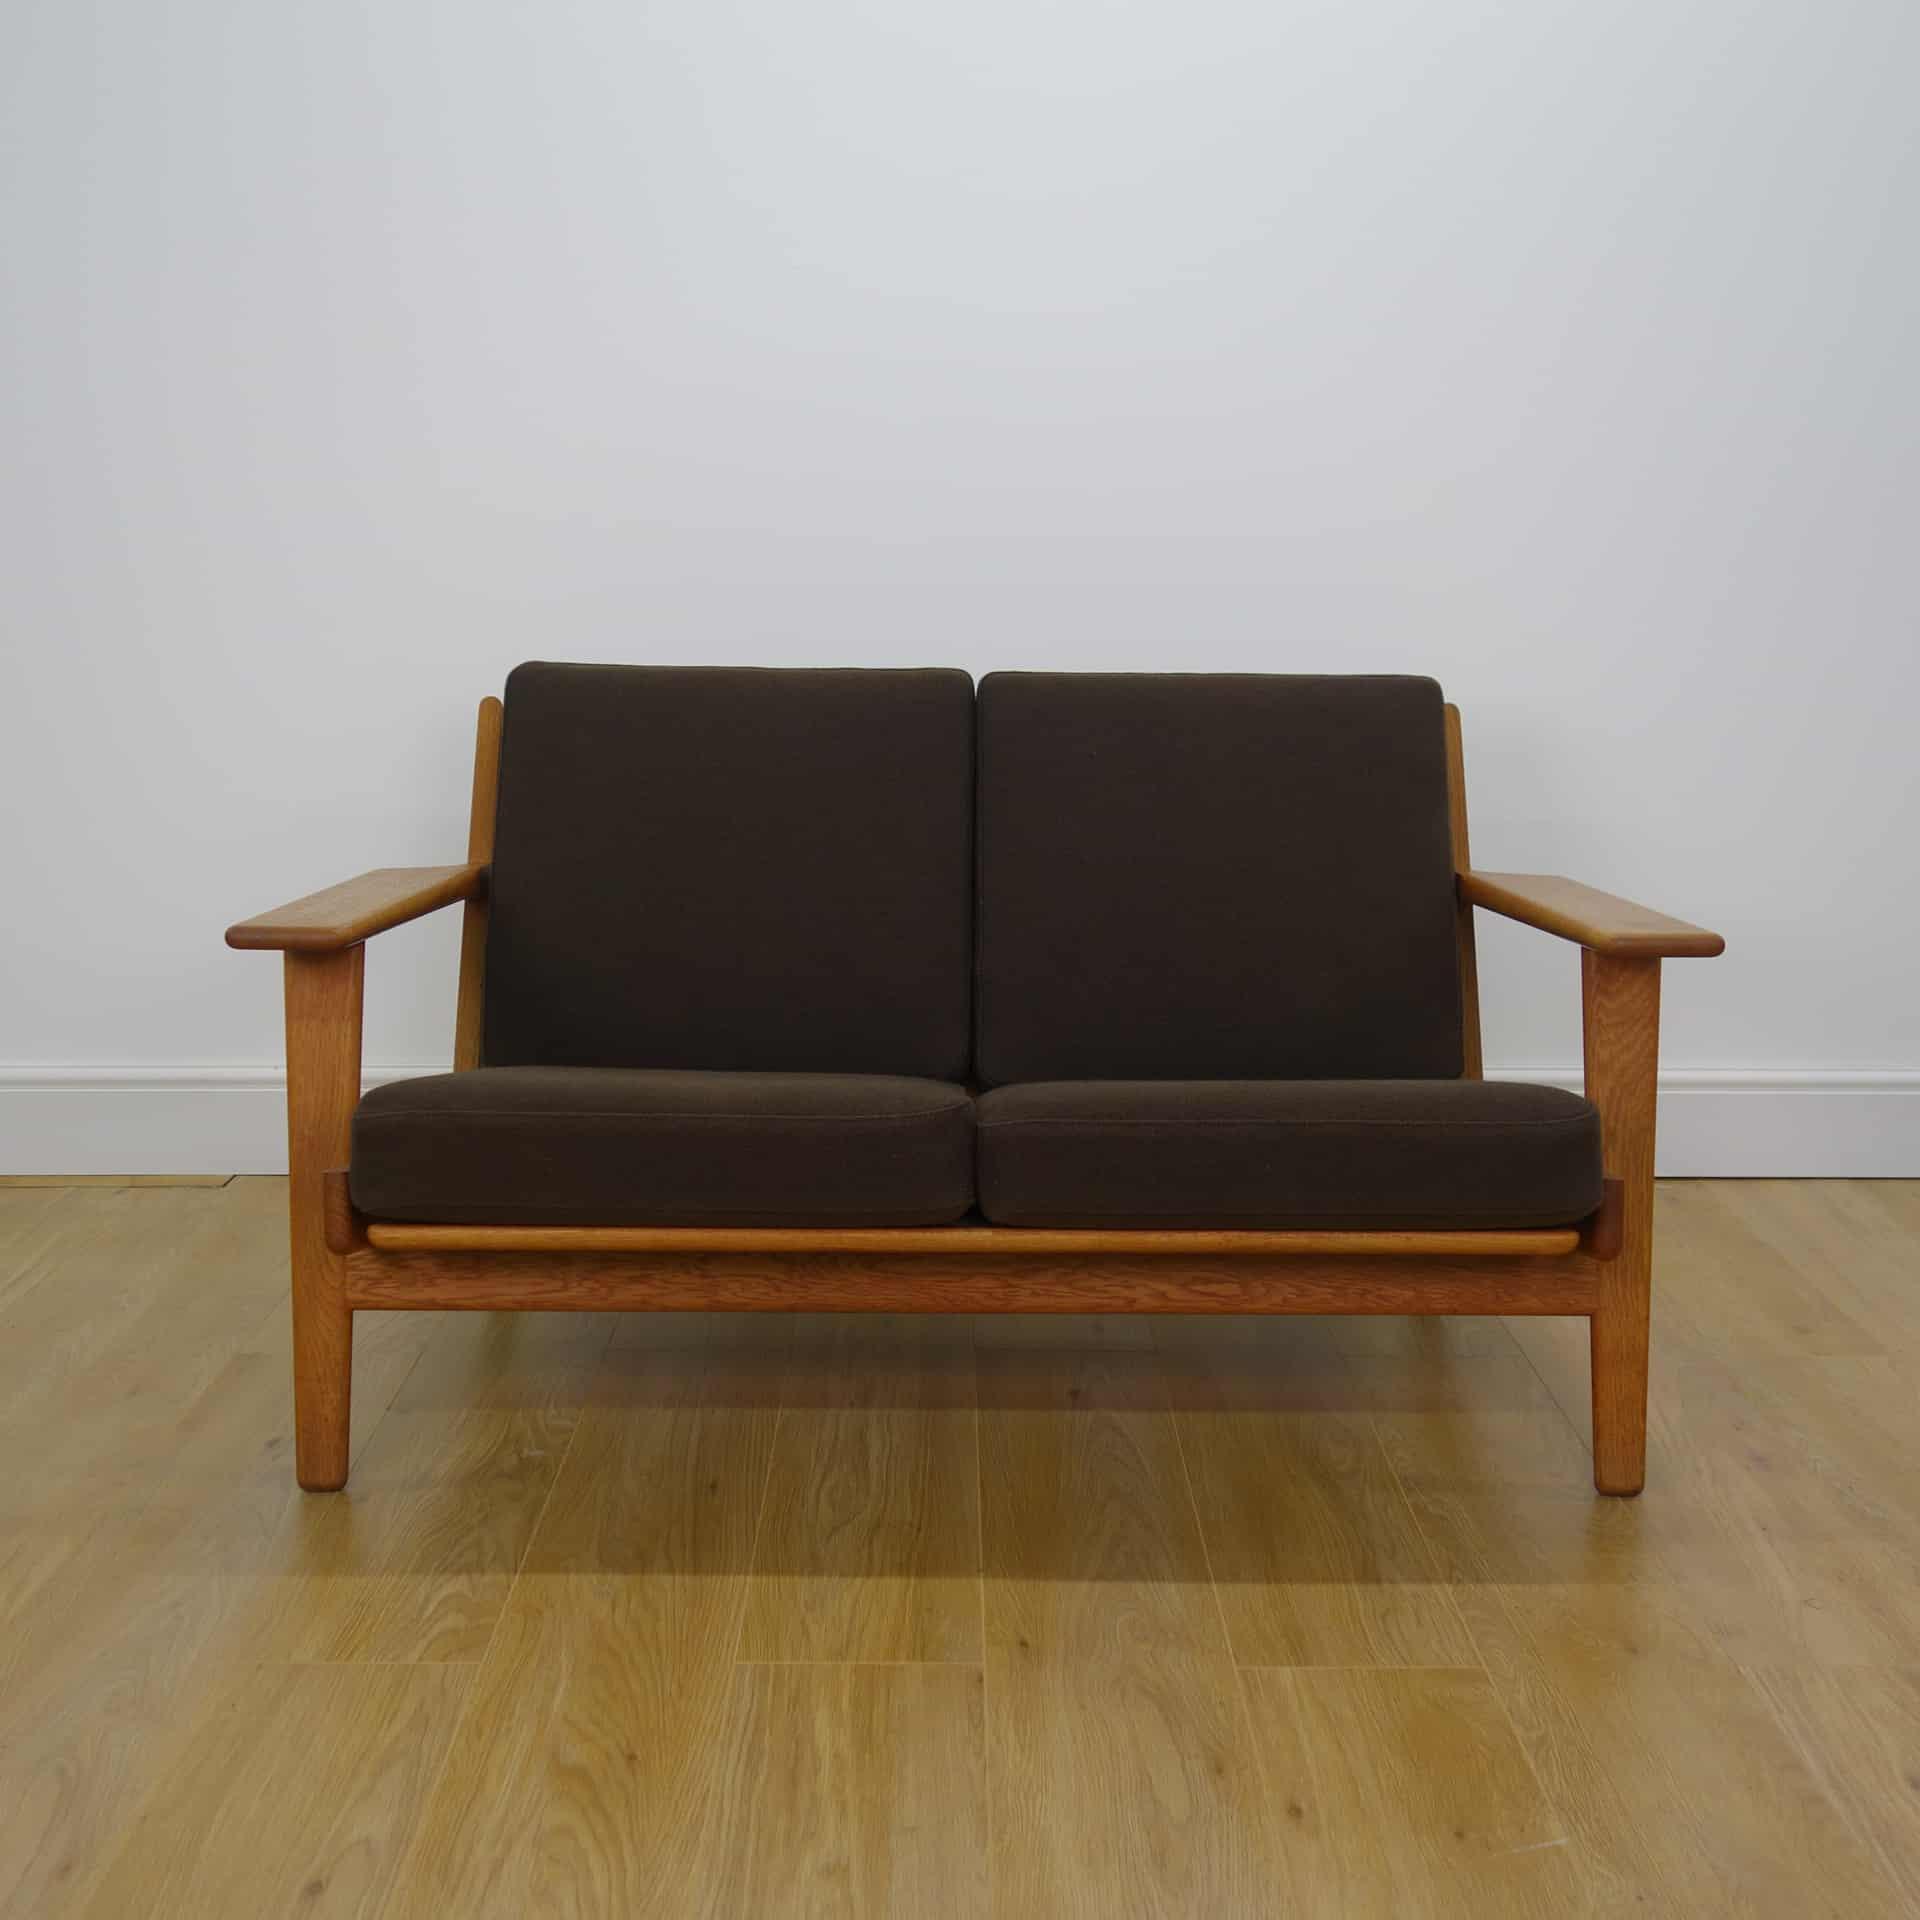 1960s 2 seat Plank sofa by Hans Wegner